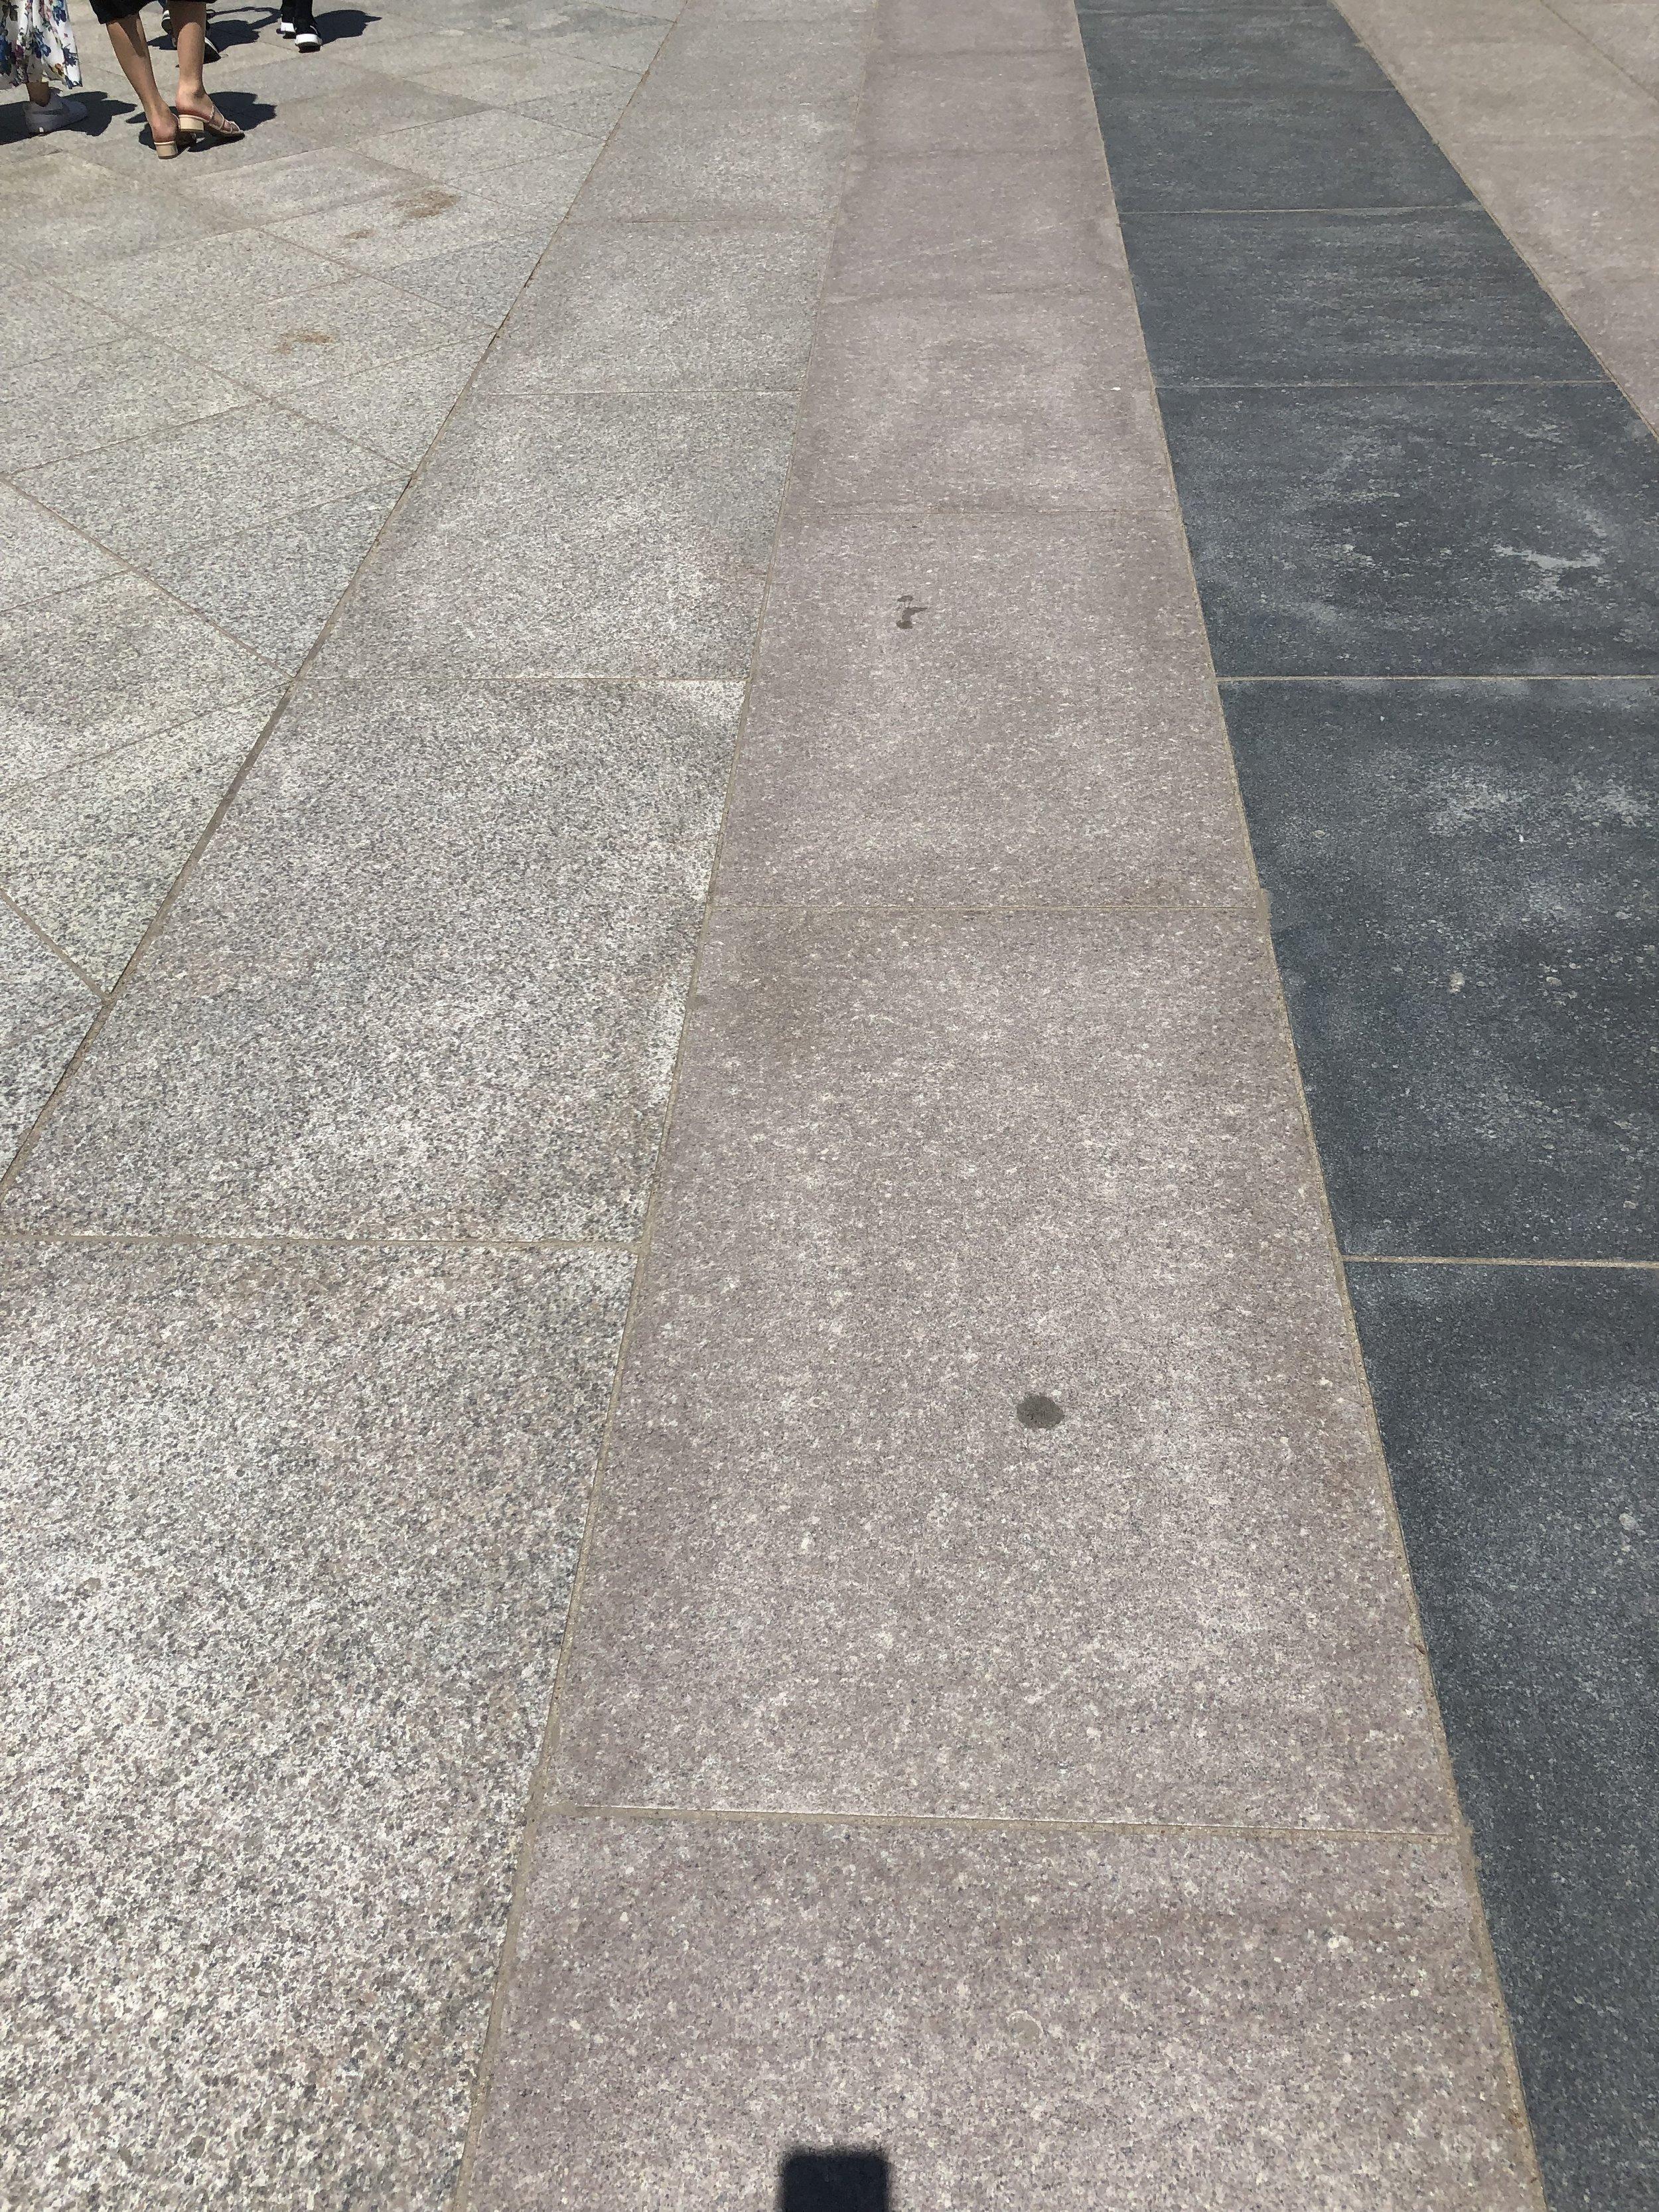 Buddhist progression from India to China, Korea then Japan, express in granite at Toda-ji (Nara))